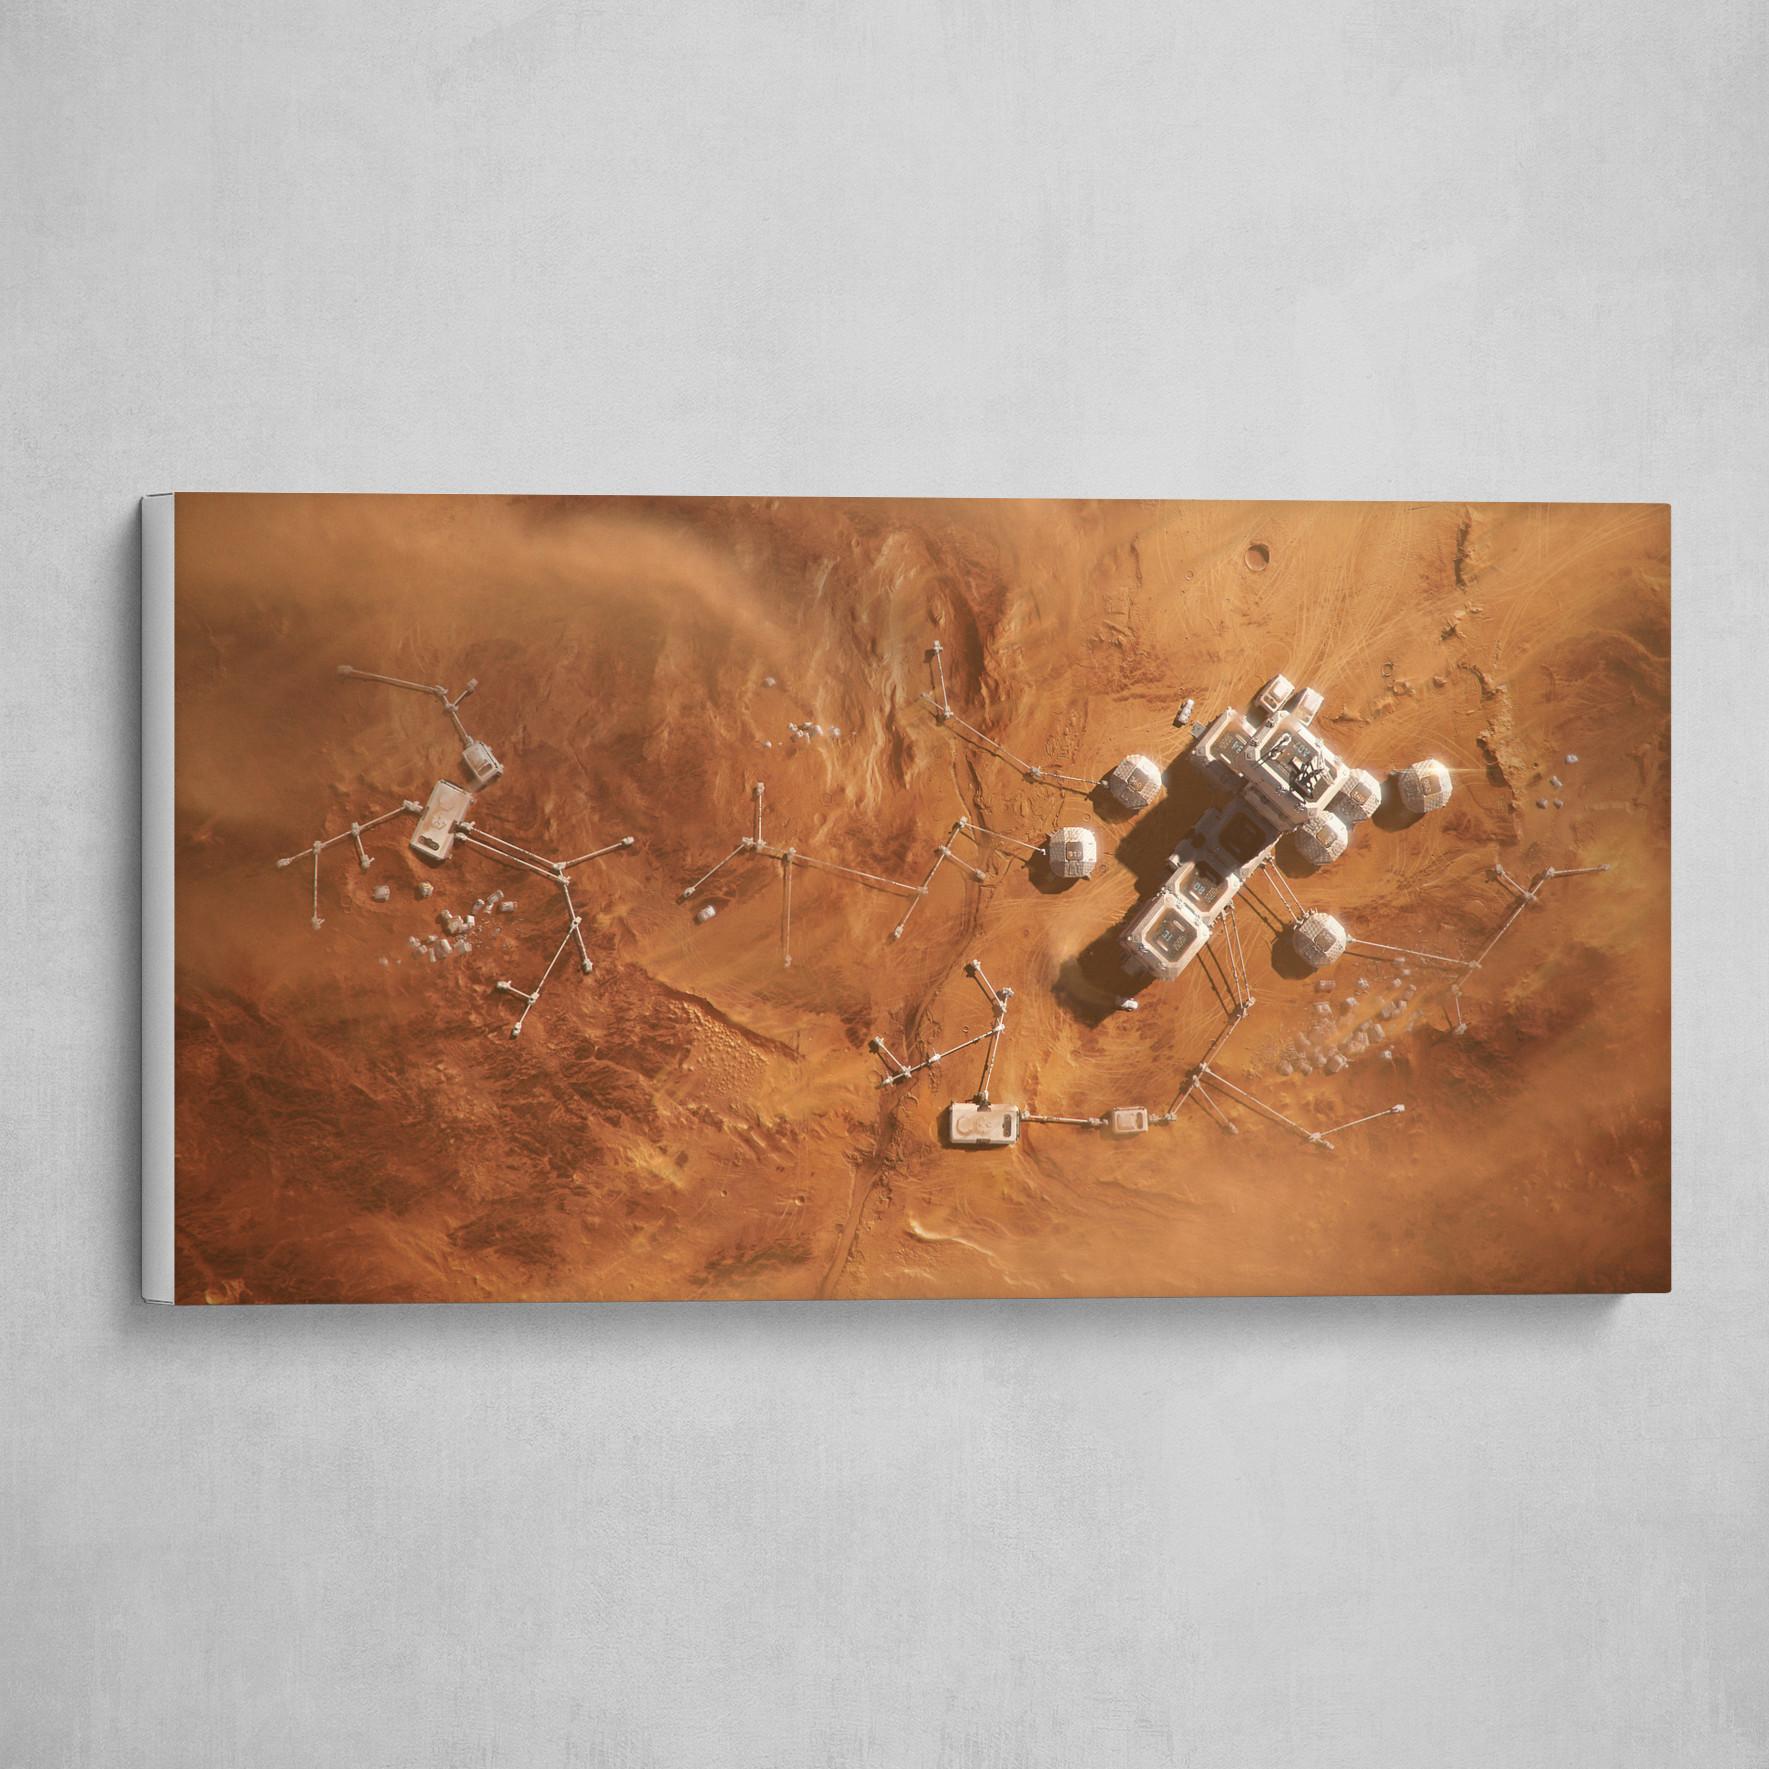 SOL 081 / Martian Base